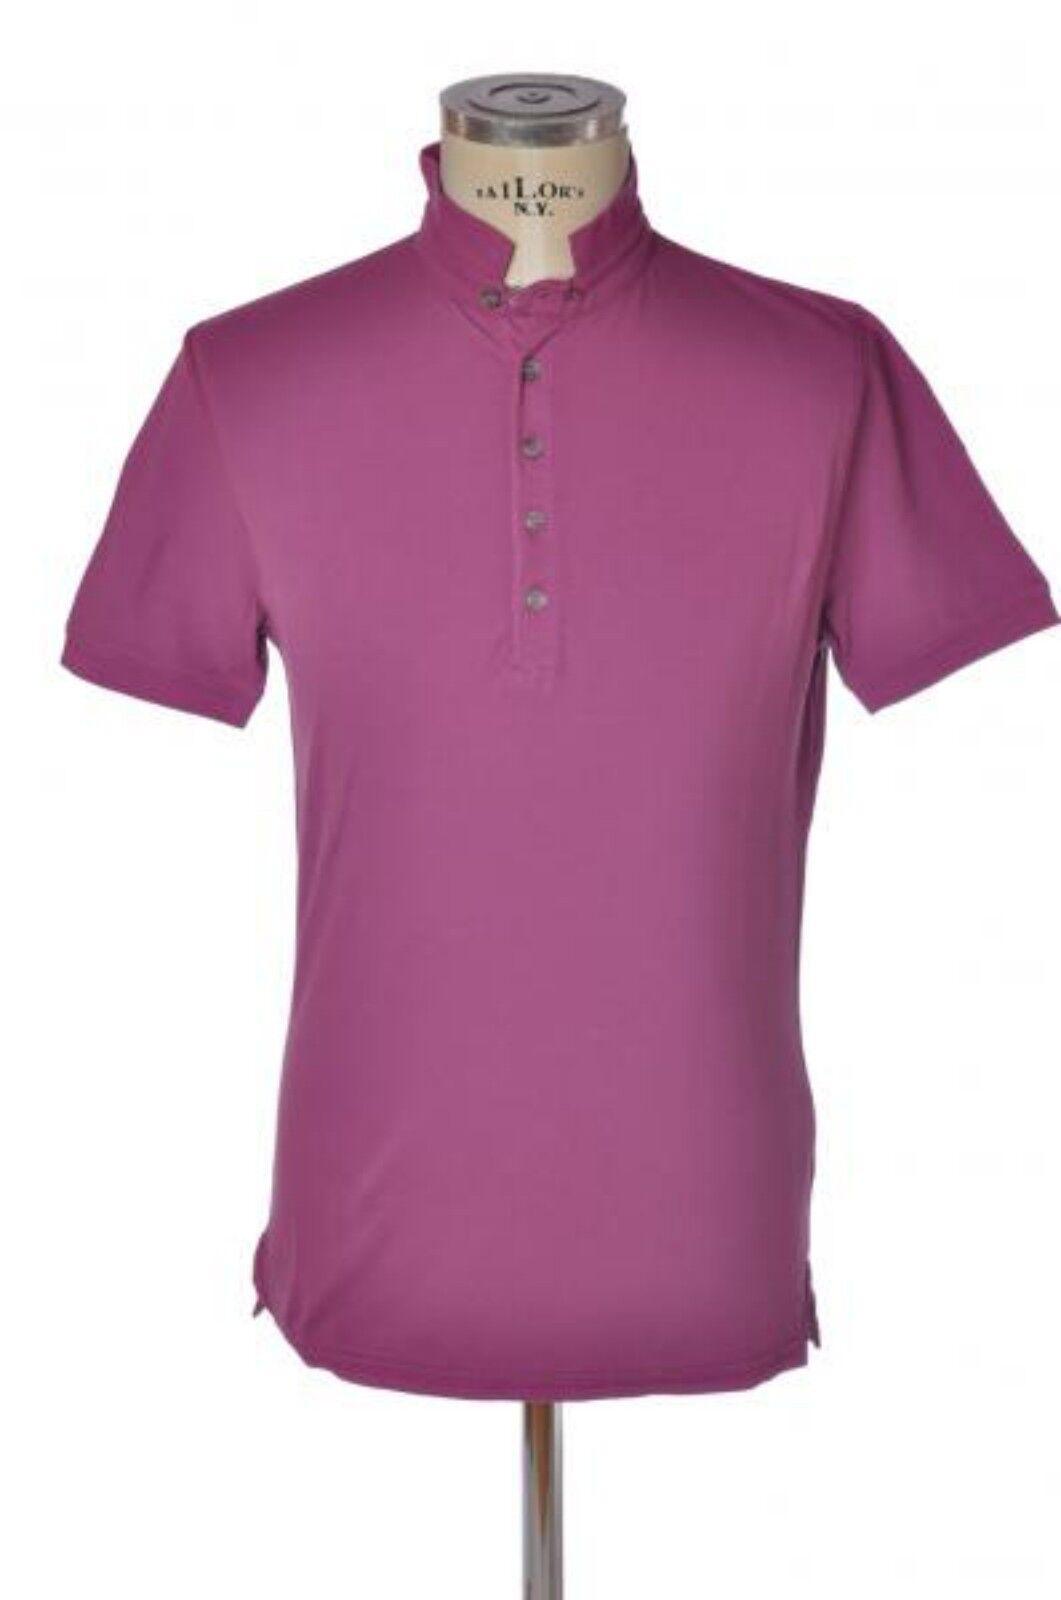 Alpha-Polo-Female - 48-violet - 1485518B161920